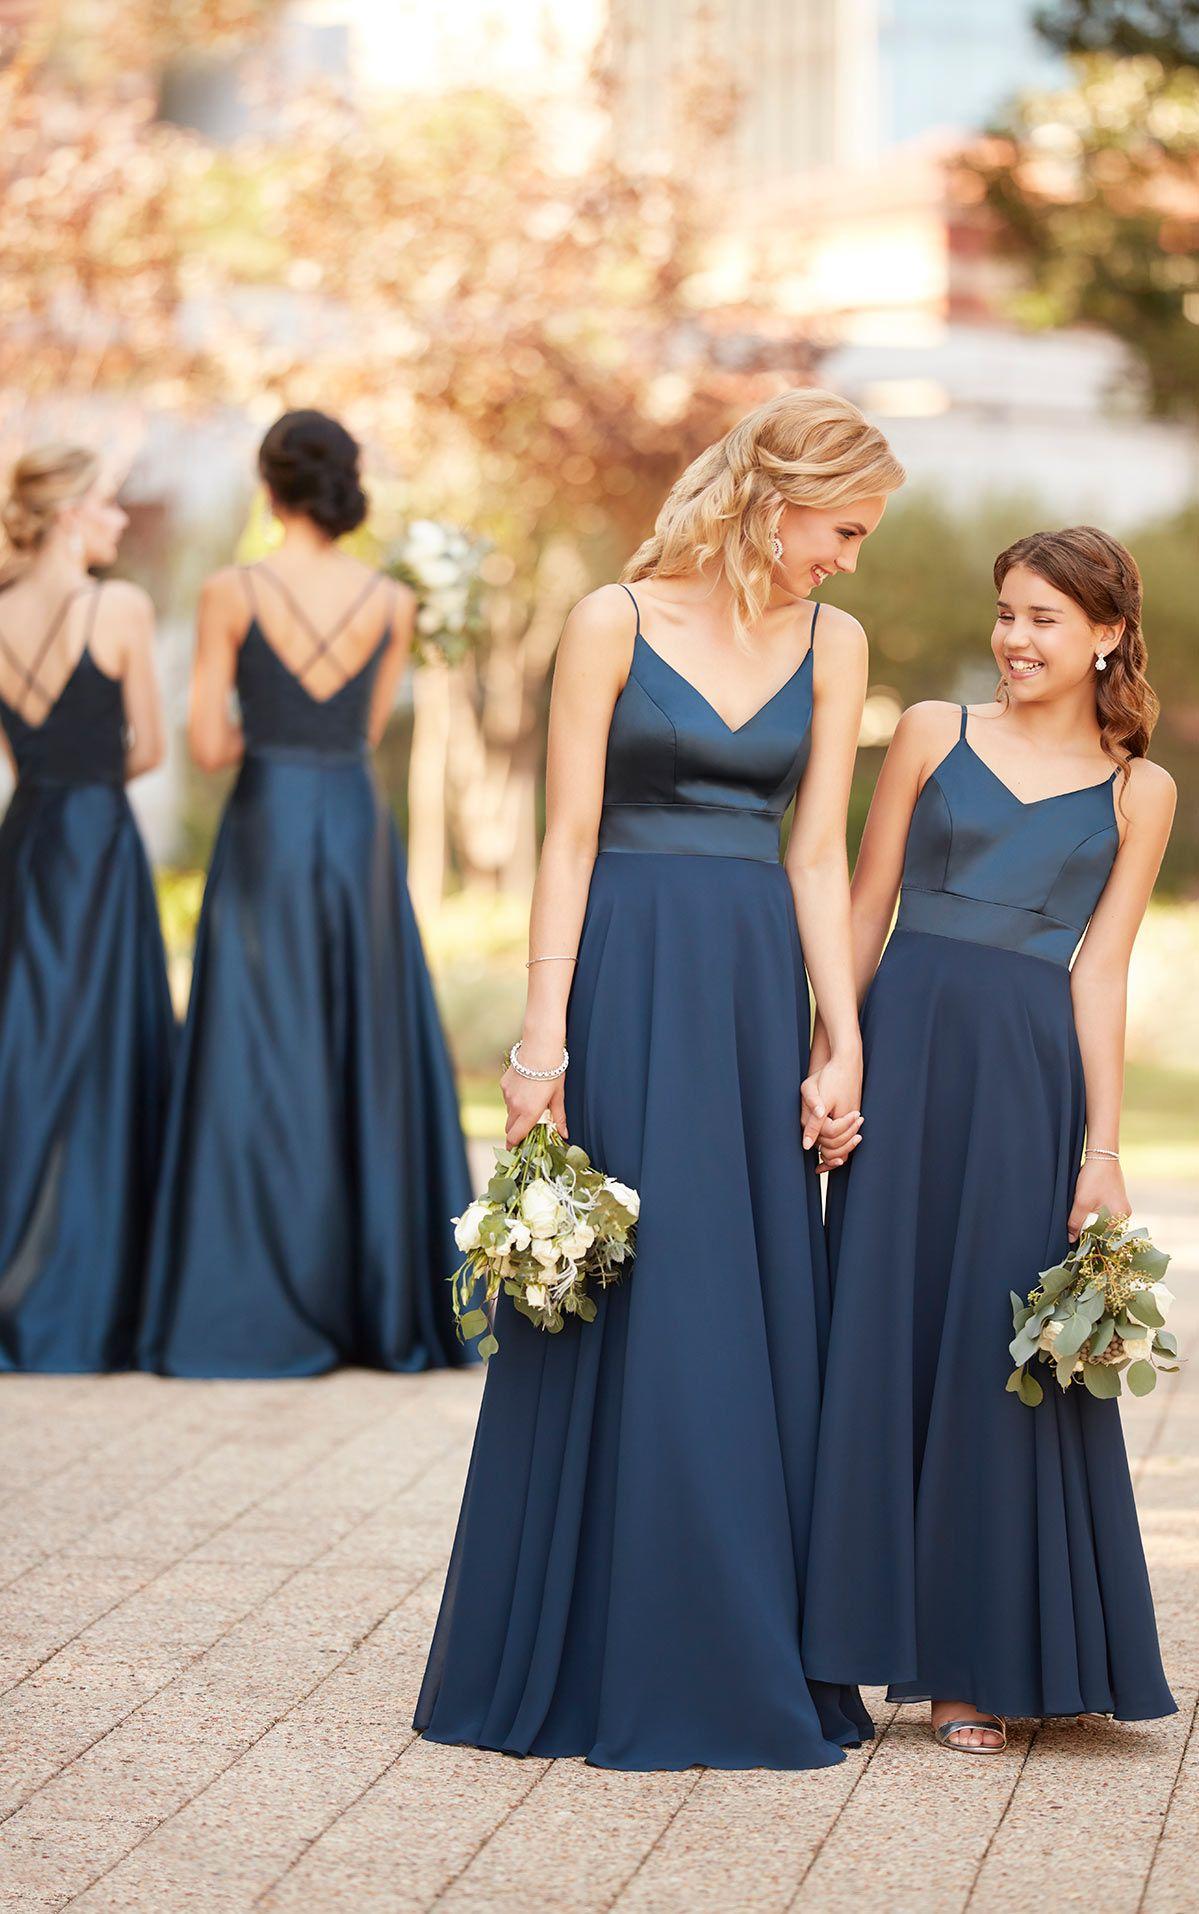 7363f9626 Mixed Material Junior Bridesmaid Dress - Sorella Vita Bridesmaid ...